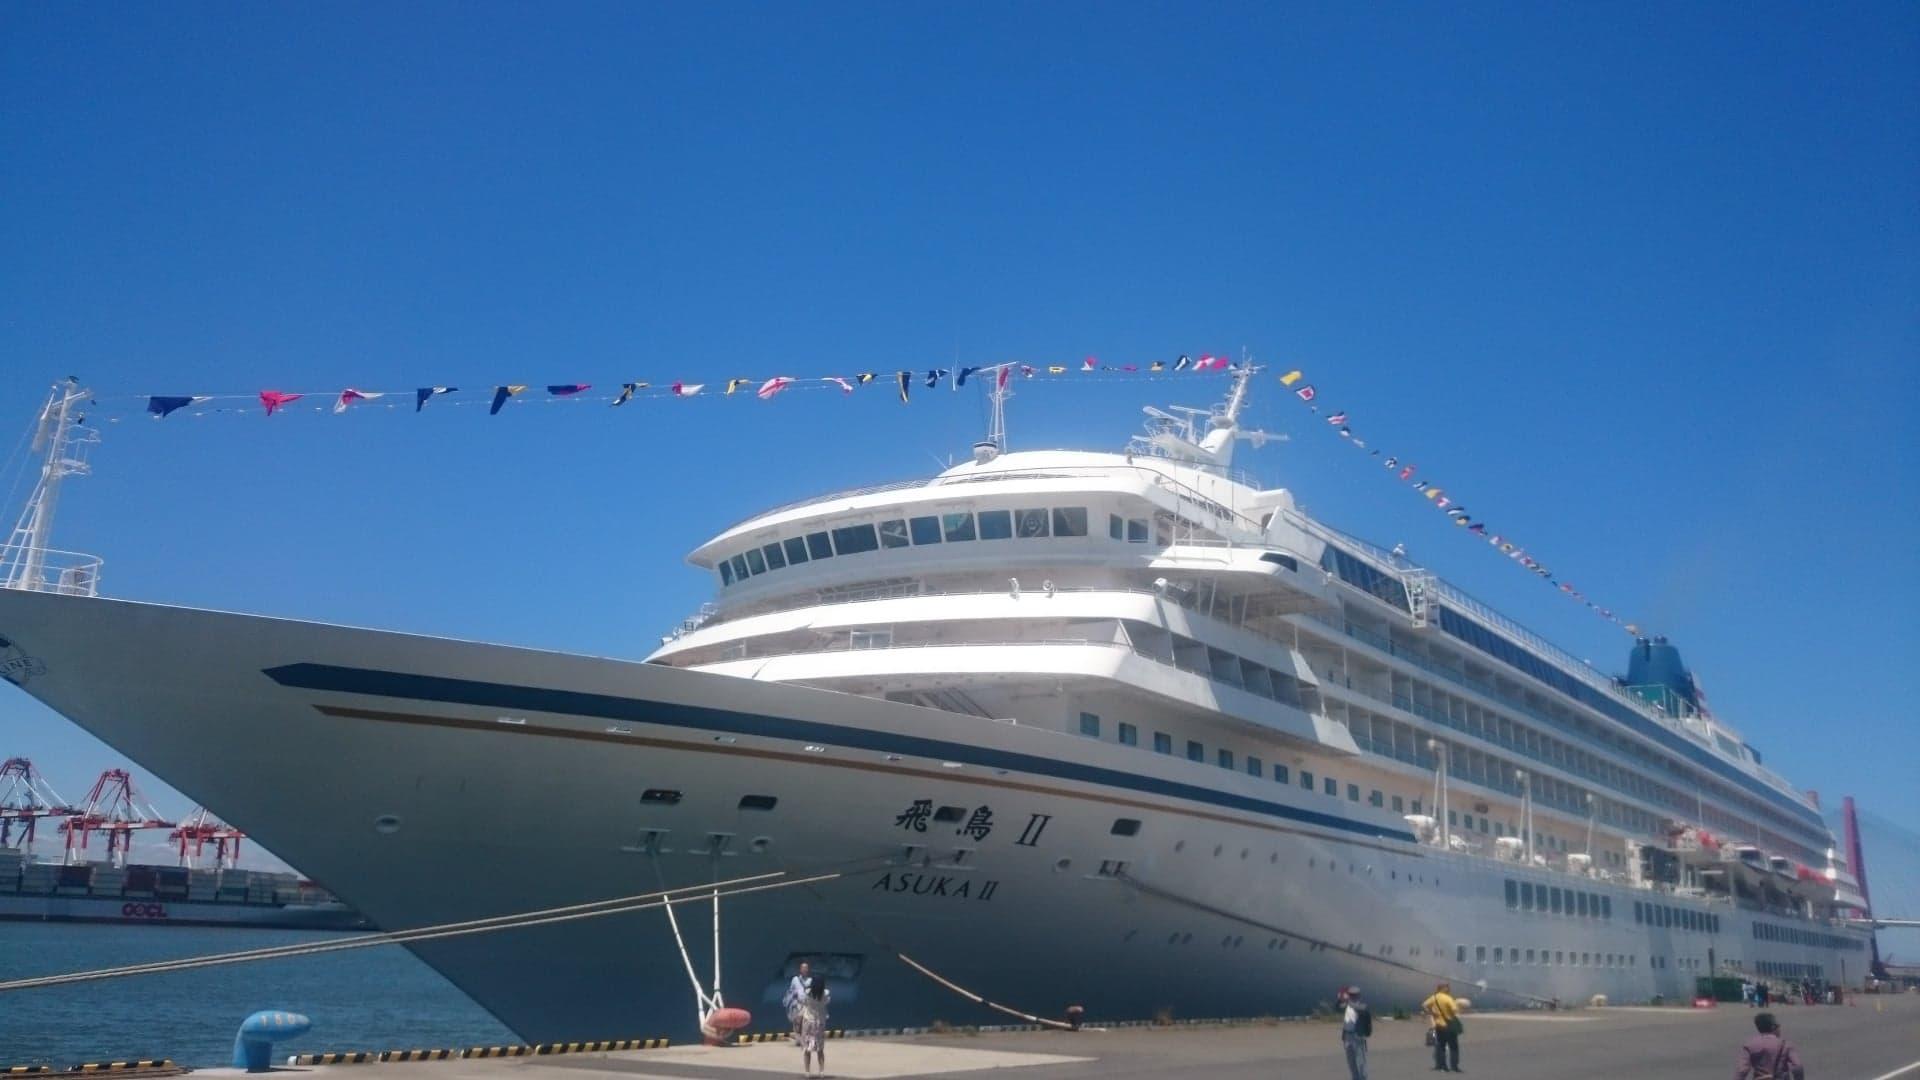 Statek Asuka II (fot. Archiwum prywatne)